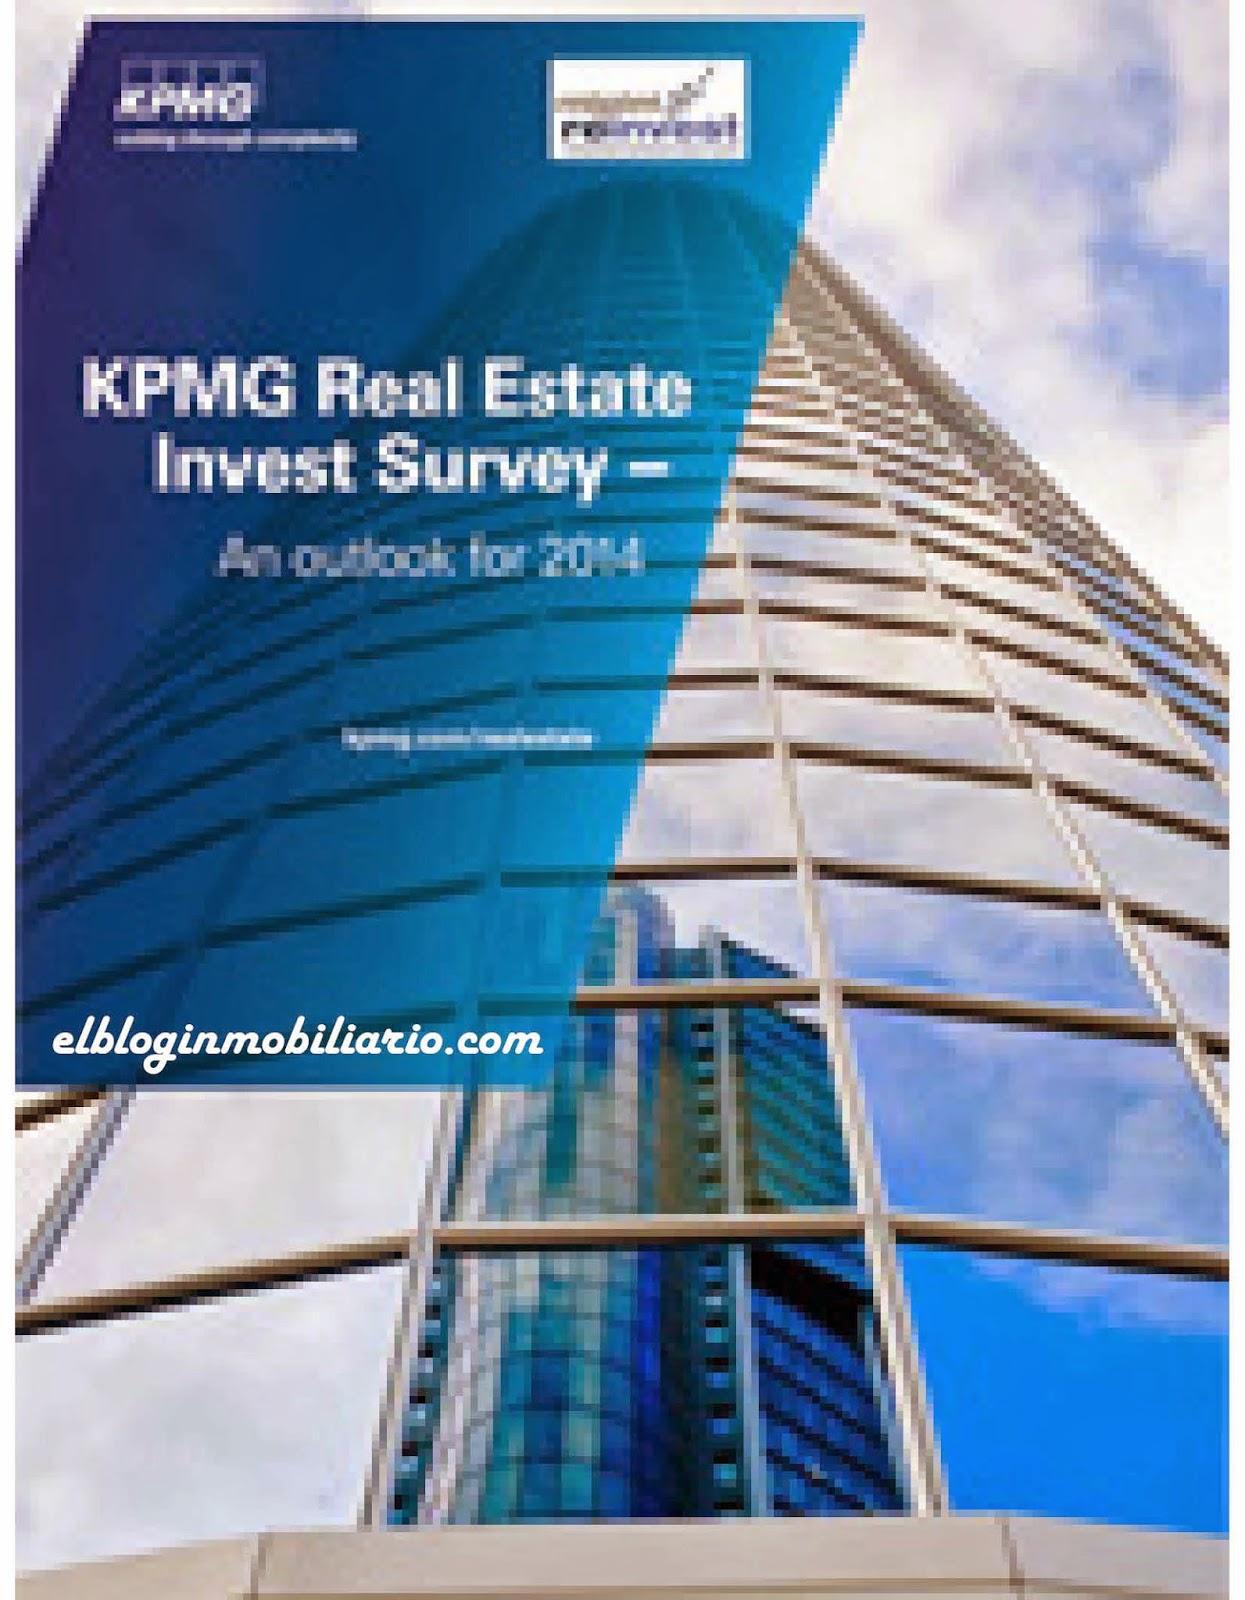 KPMG Real Estate España invertir sector inmobiliario elbloginmobiliario.com